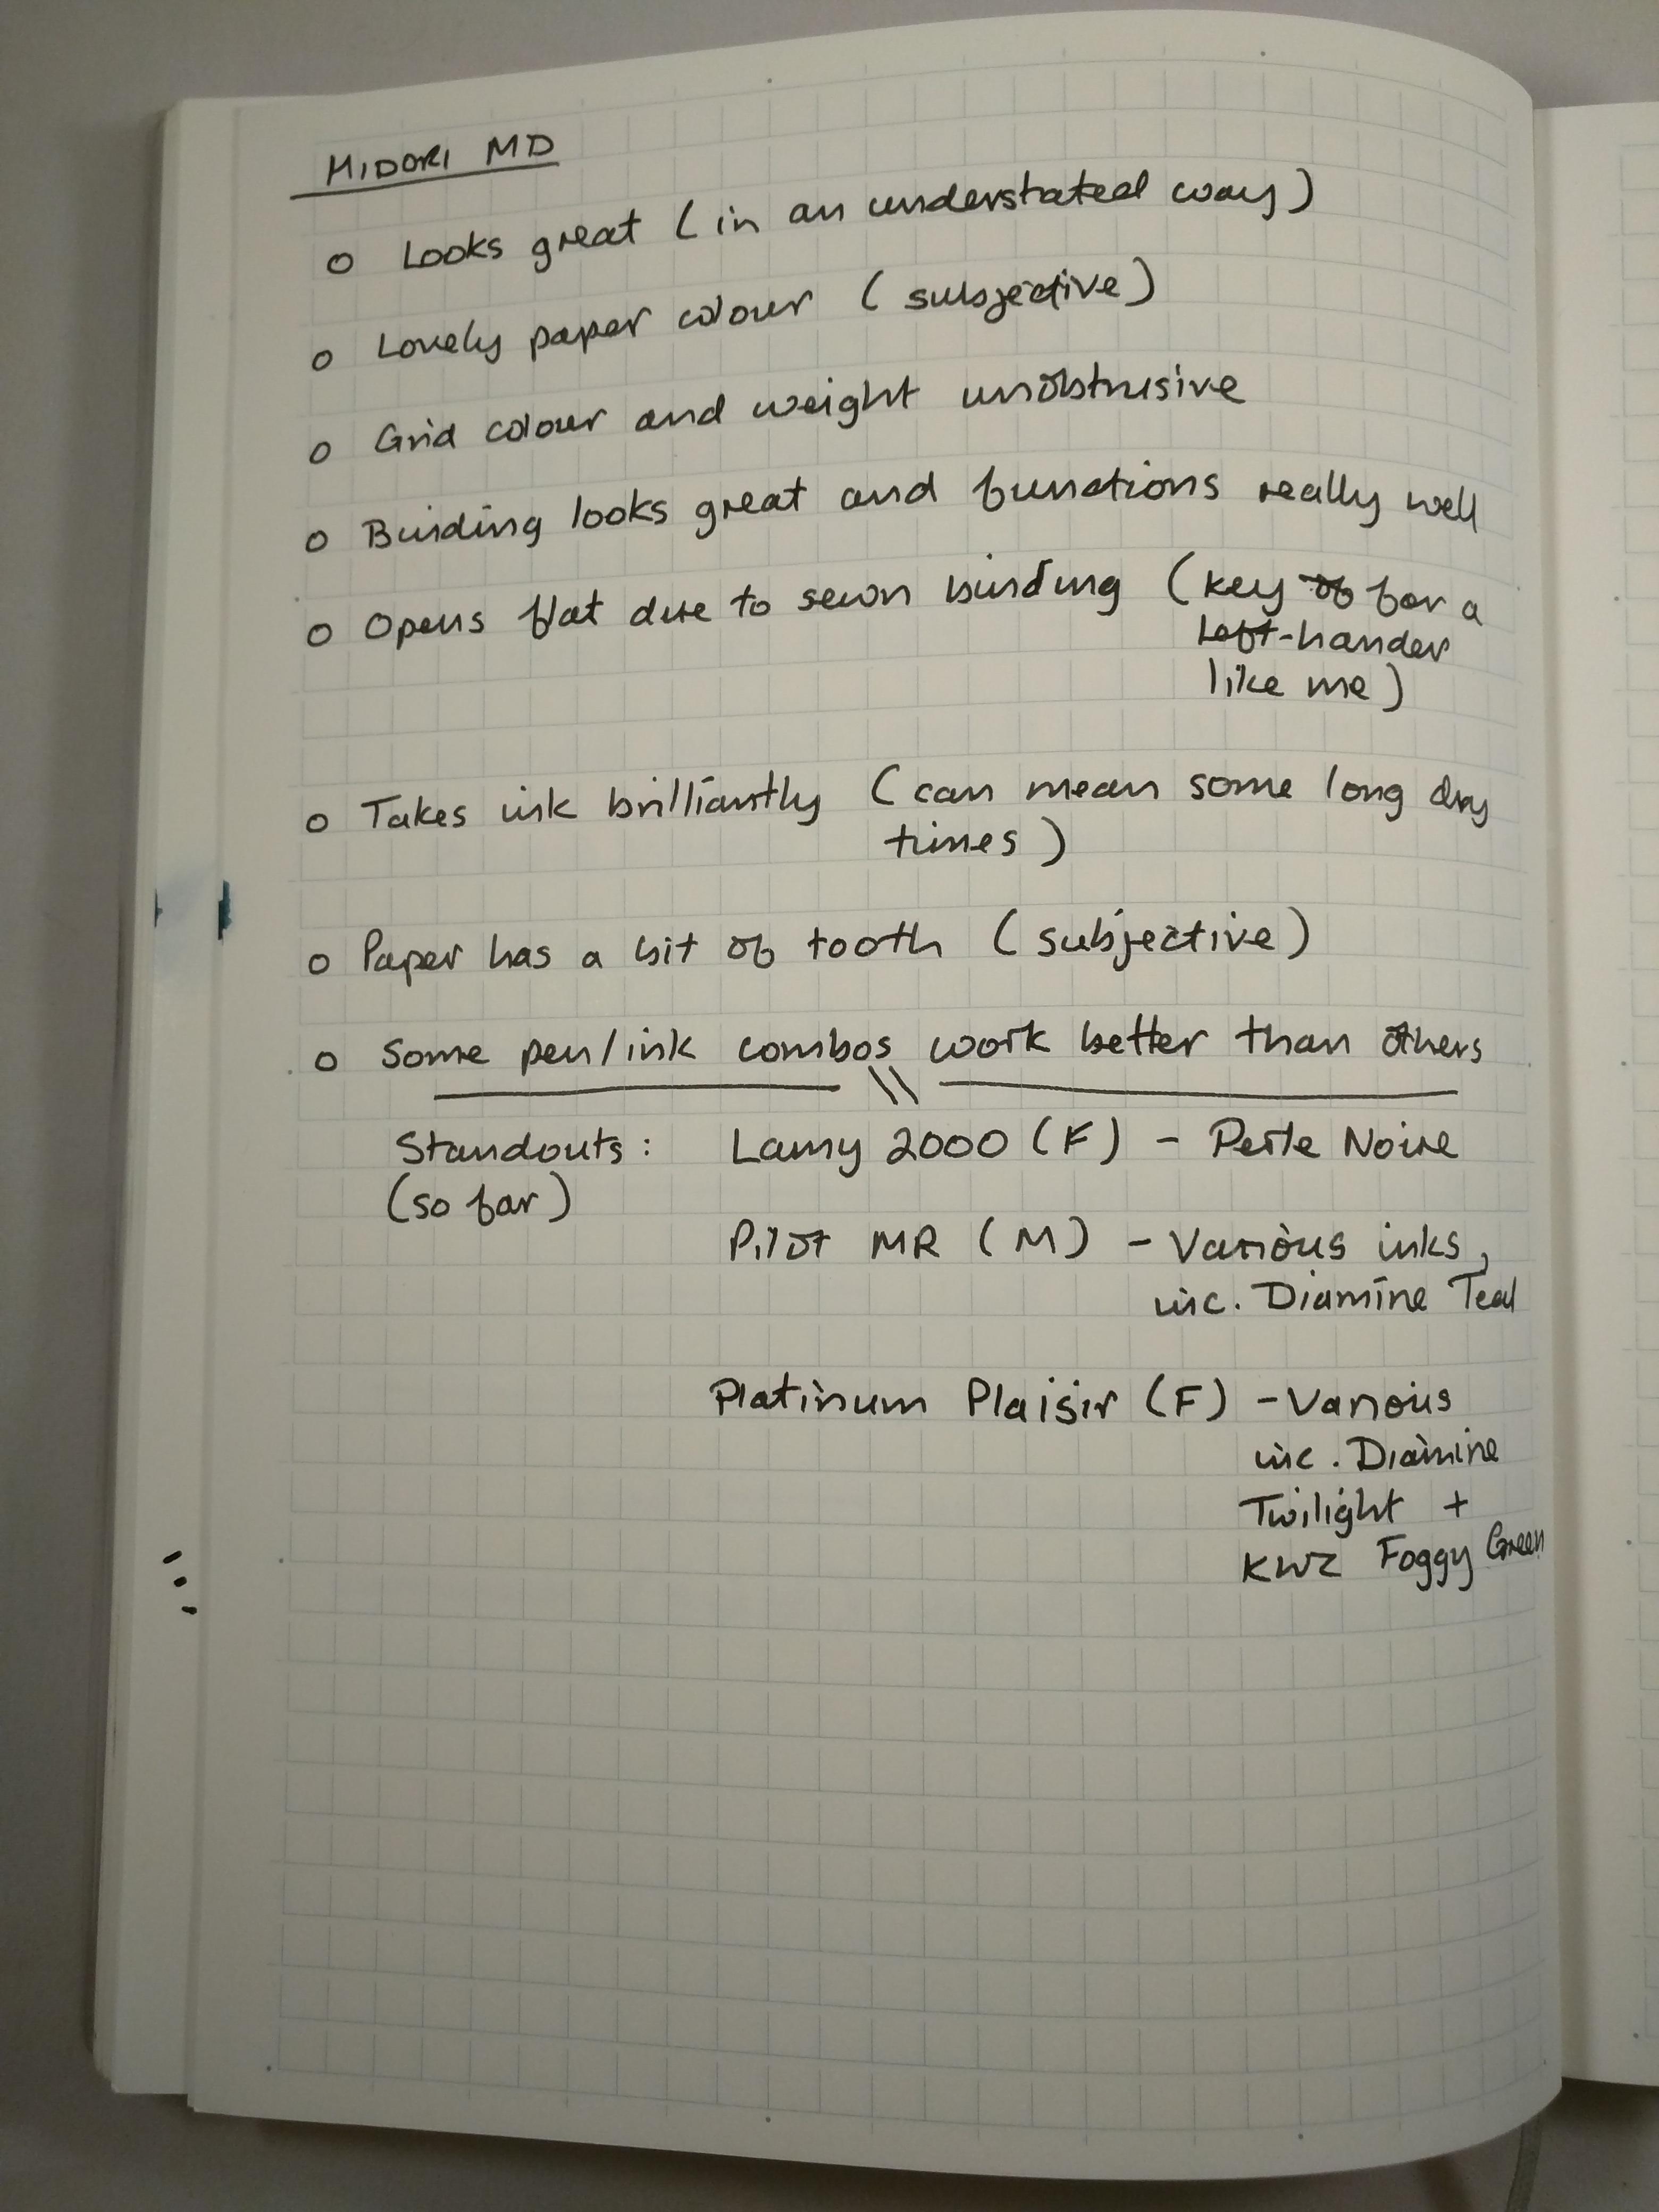 Midori MD handwriting sample